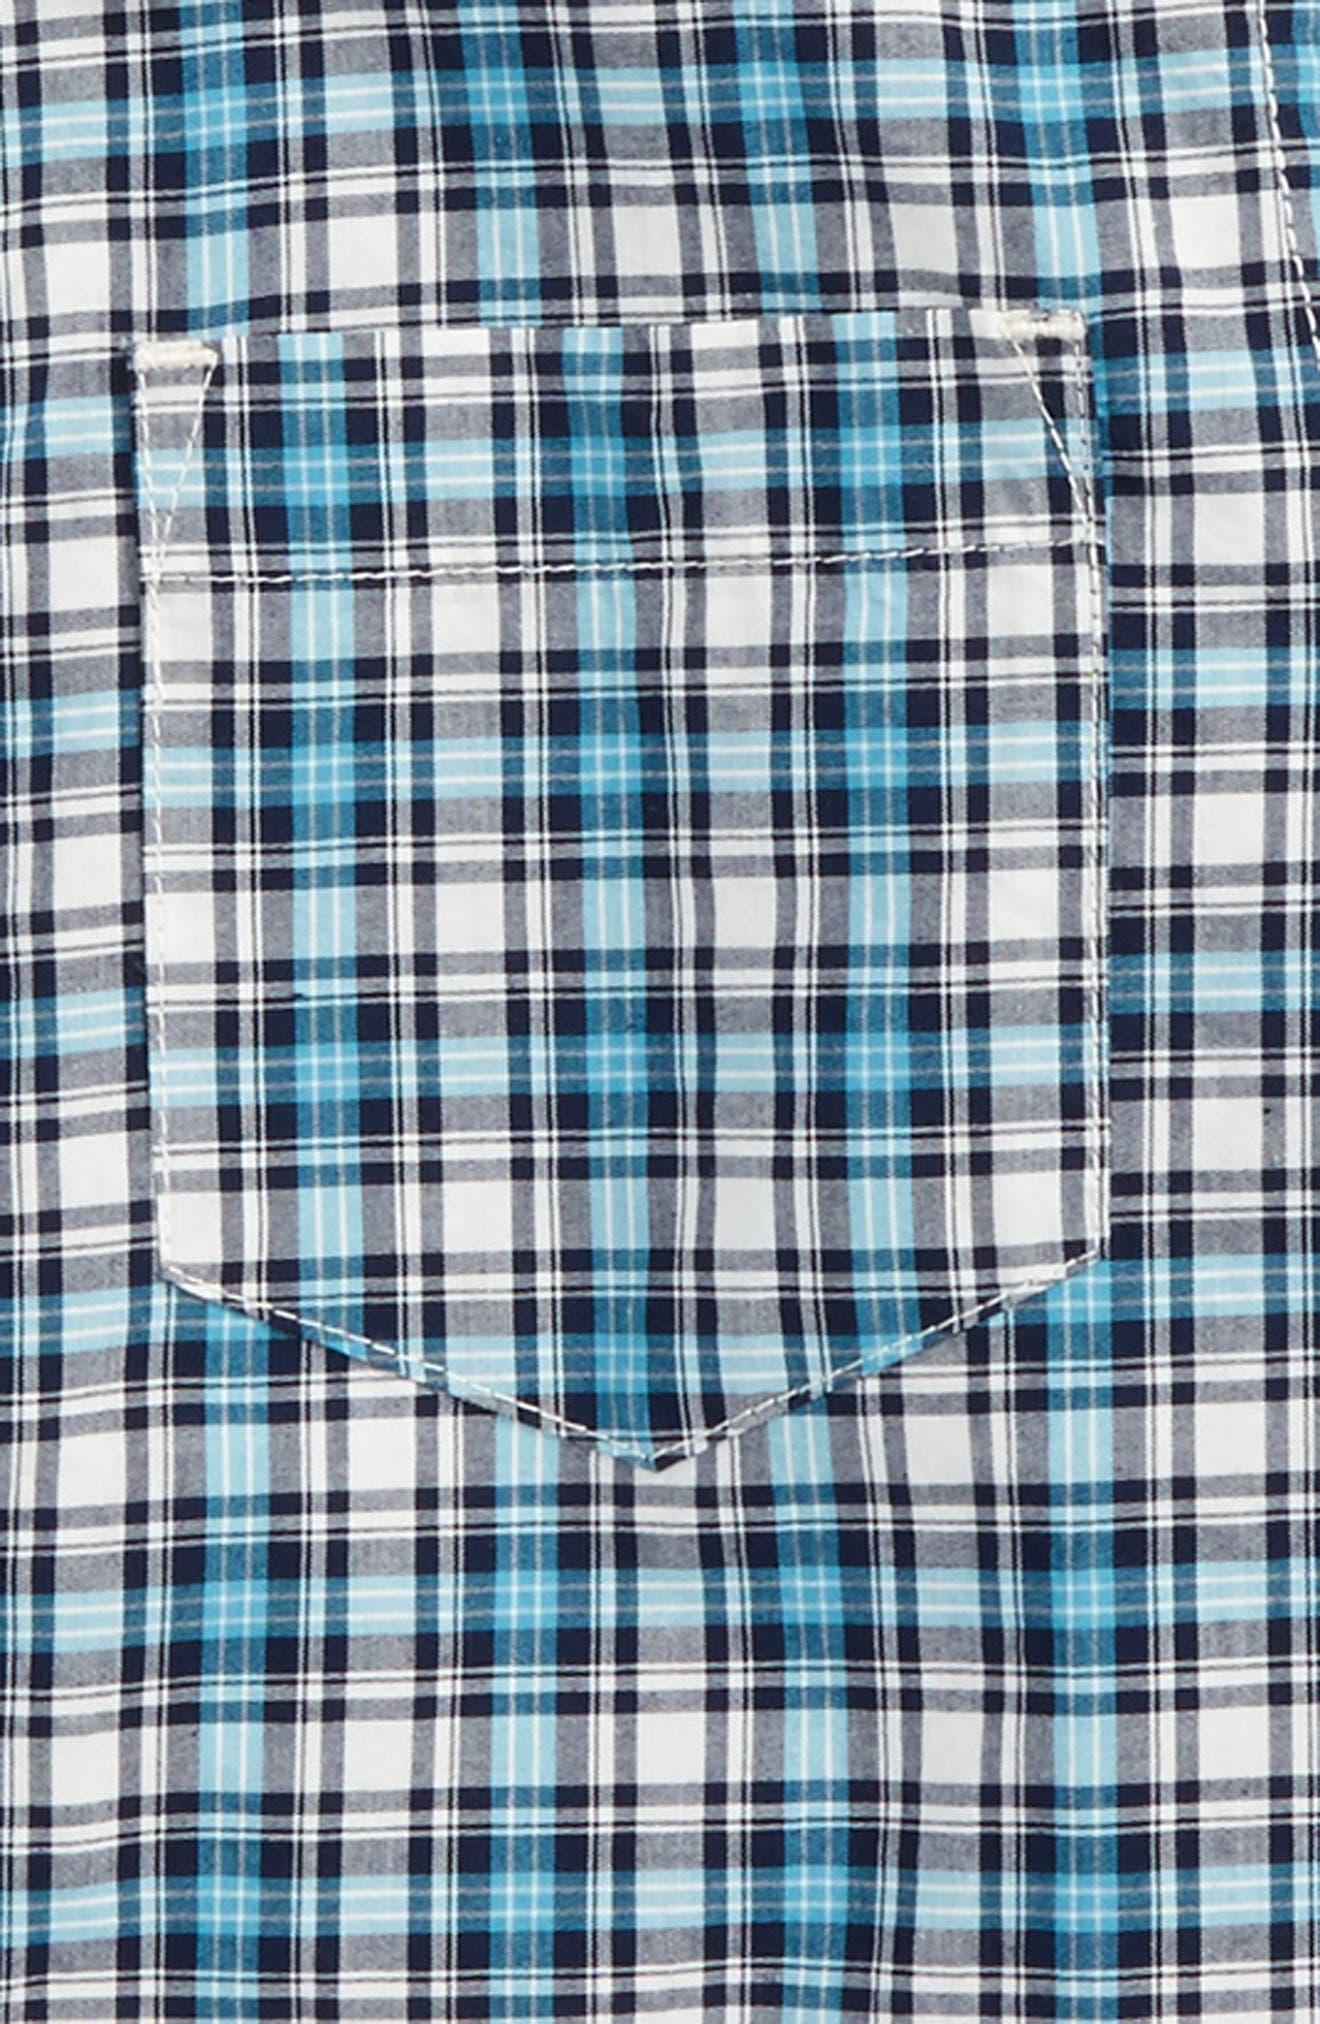 Heath Plaid Woven Shirt,                             Alternate thumbnail 2, color,                             103